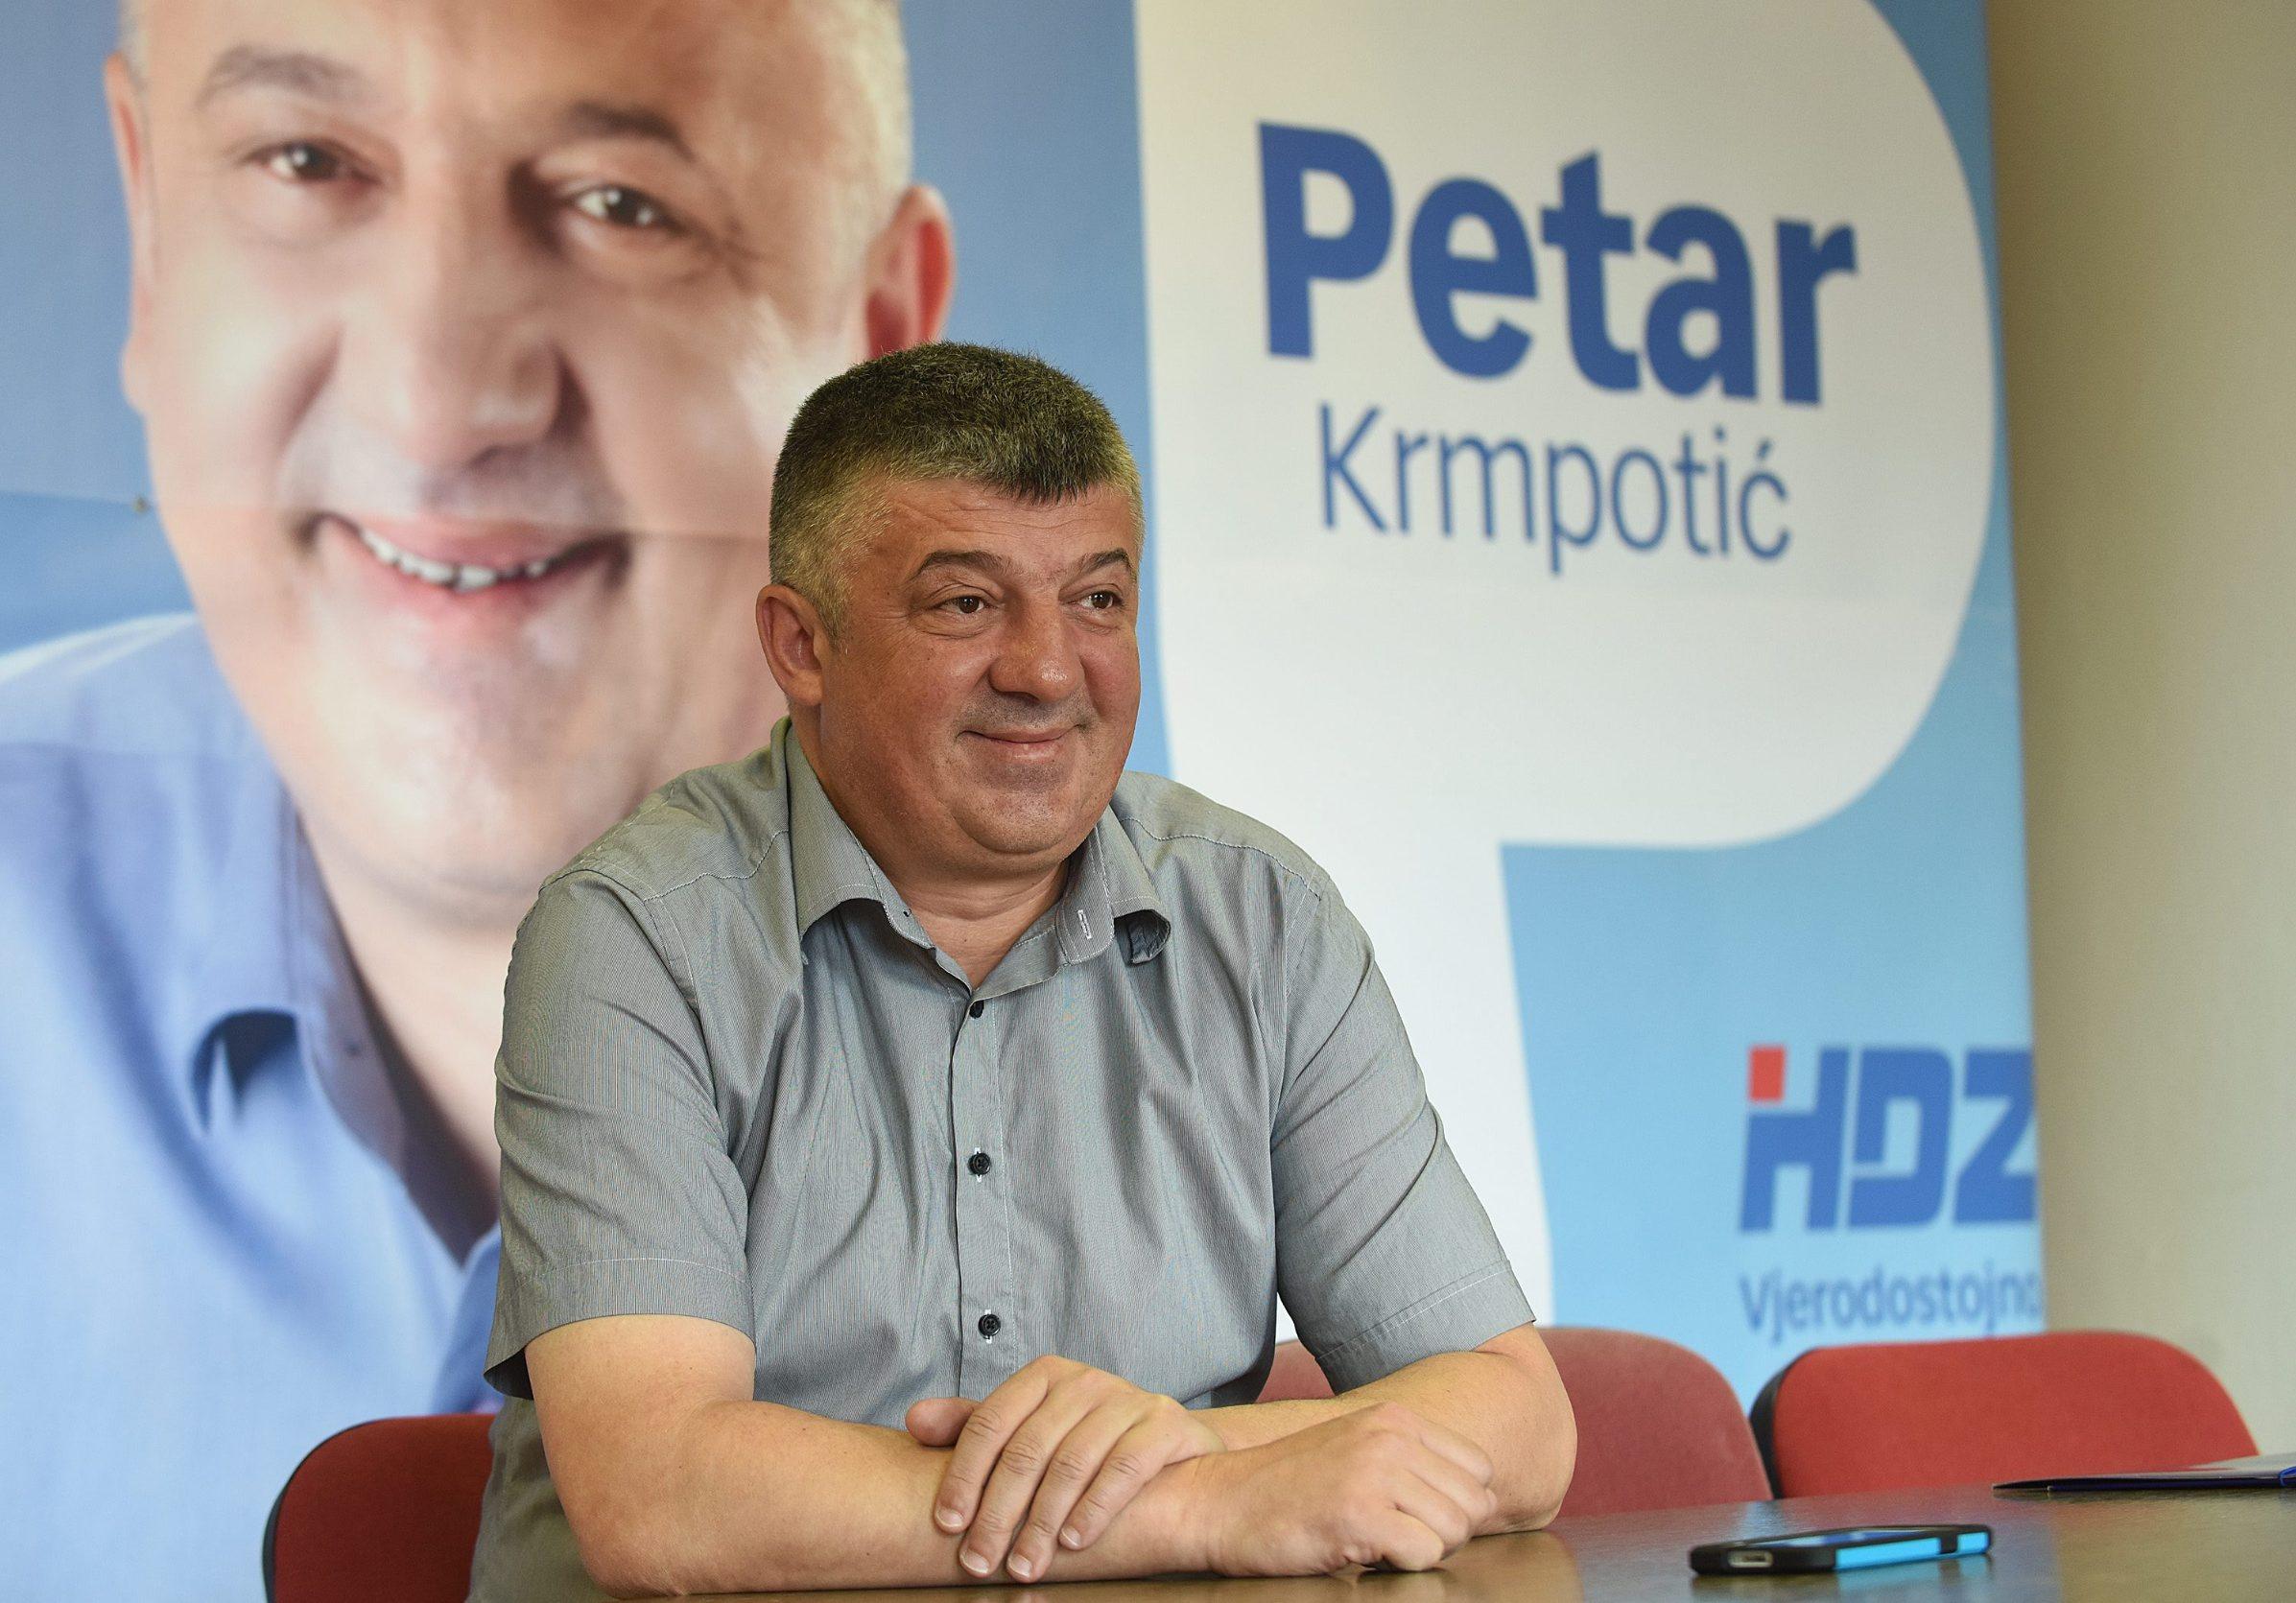 Petar Krmpotić